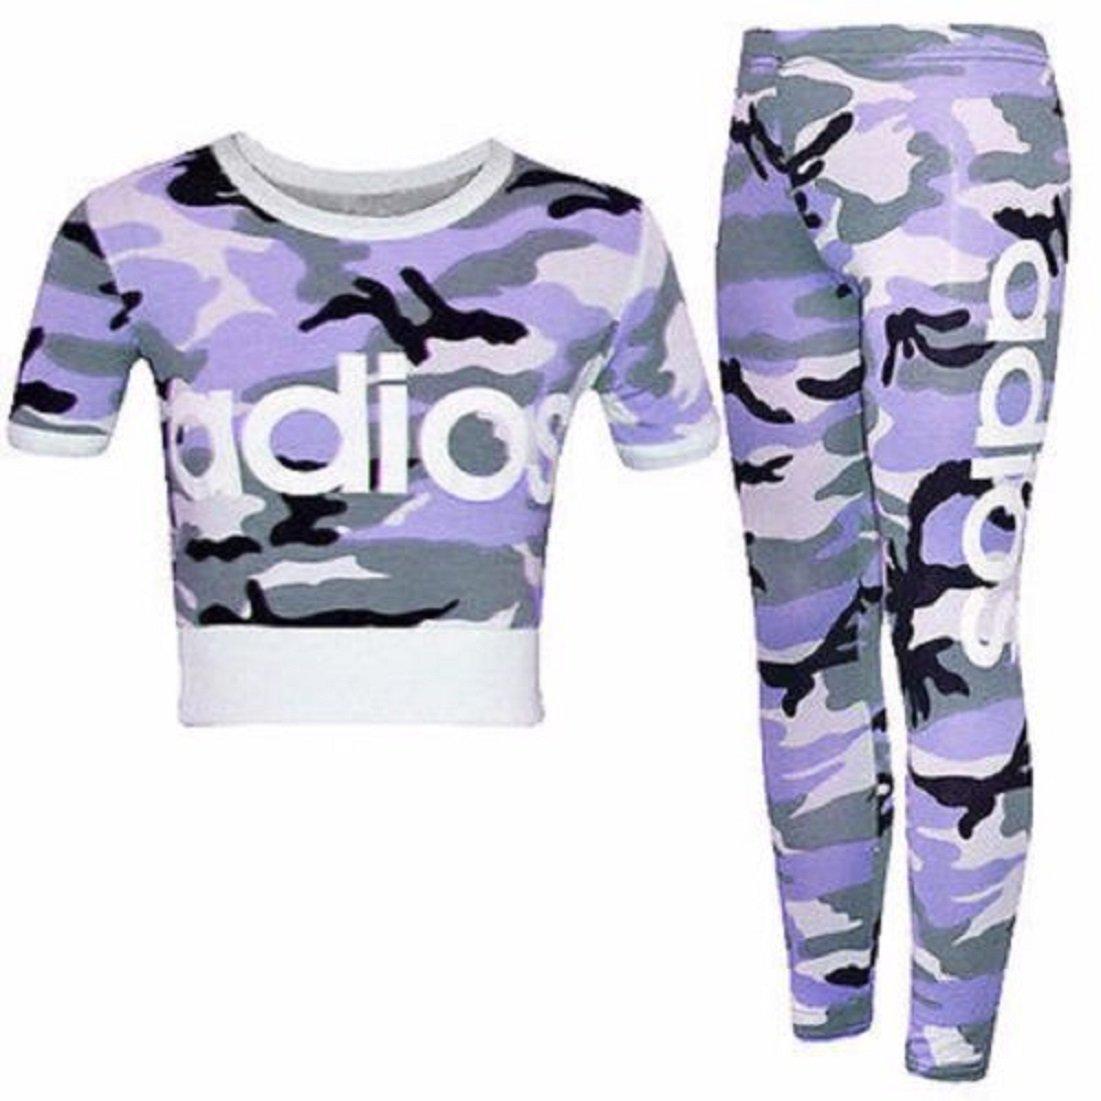 New Girls Kids Adios Print Crop Top /& Legging Loungwear Tracksuit UK Age 2-13 Years